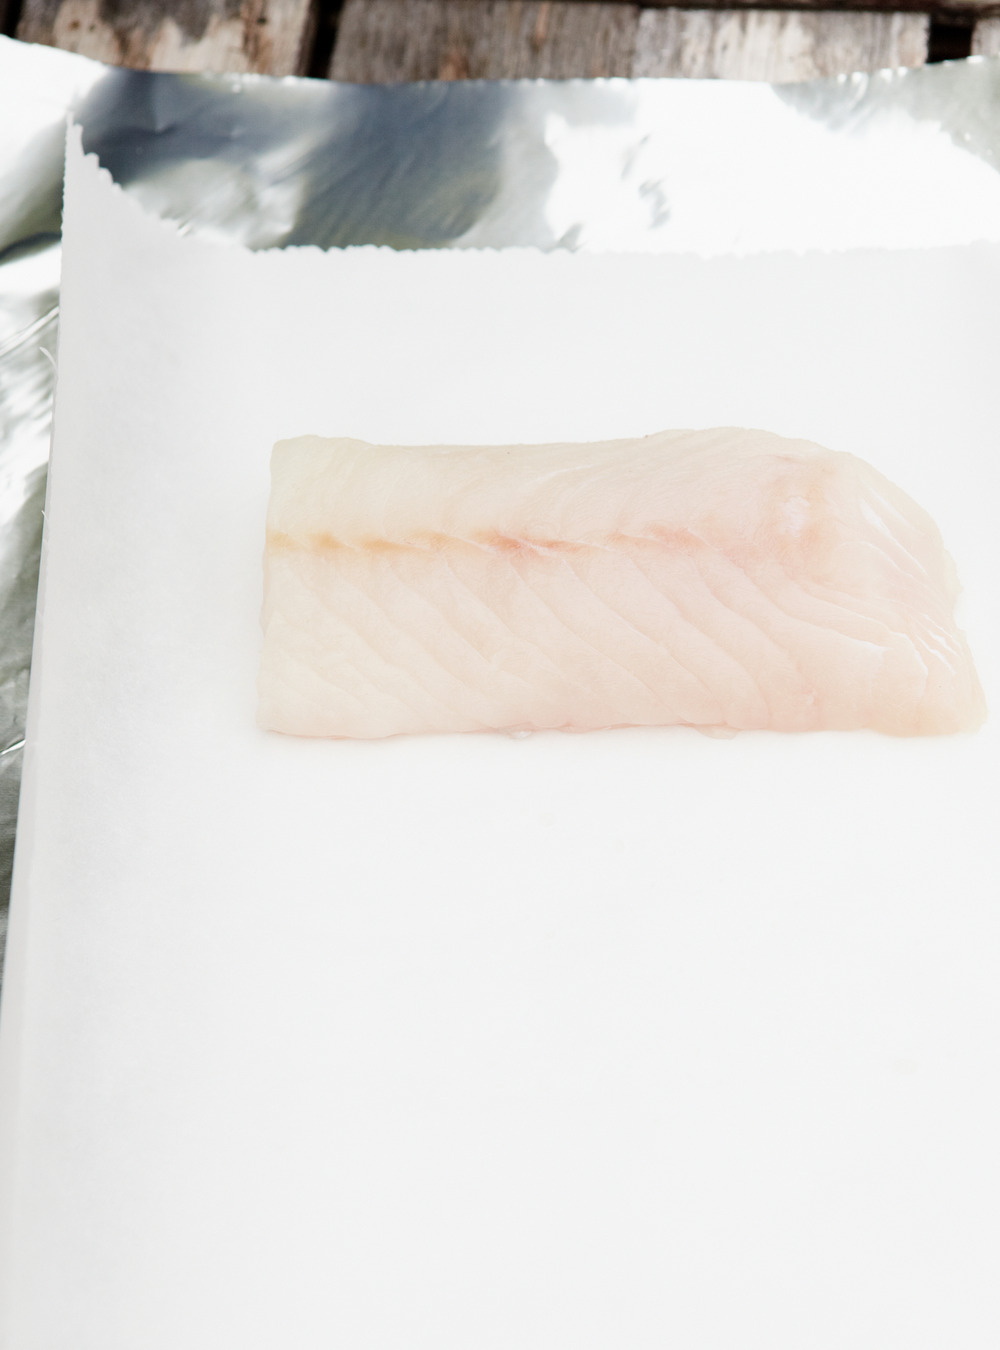 Filets de poisson croustillant aux shredded wheatmd | ricardo